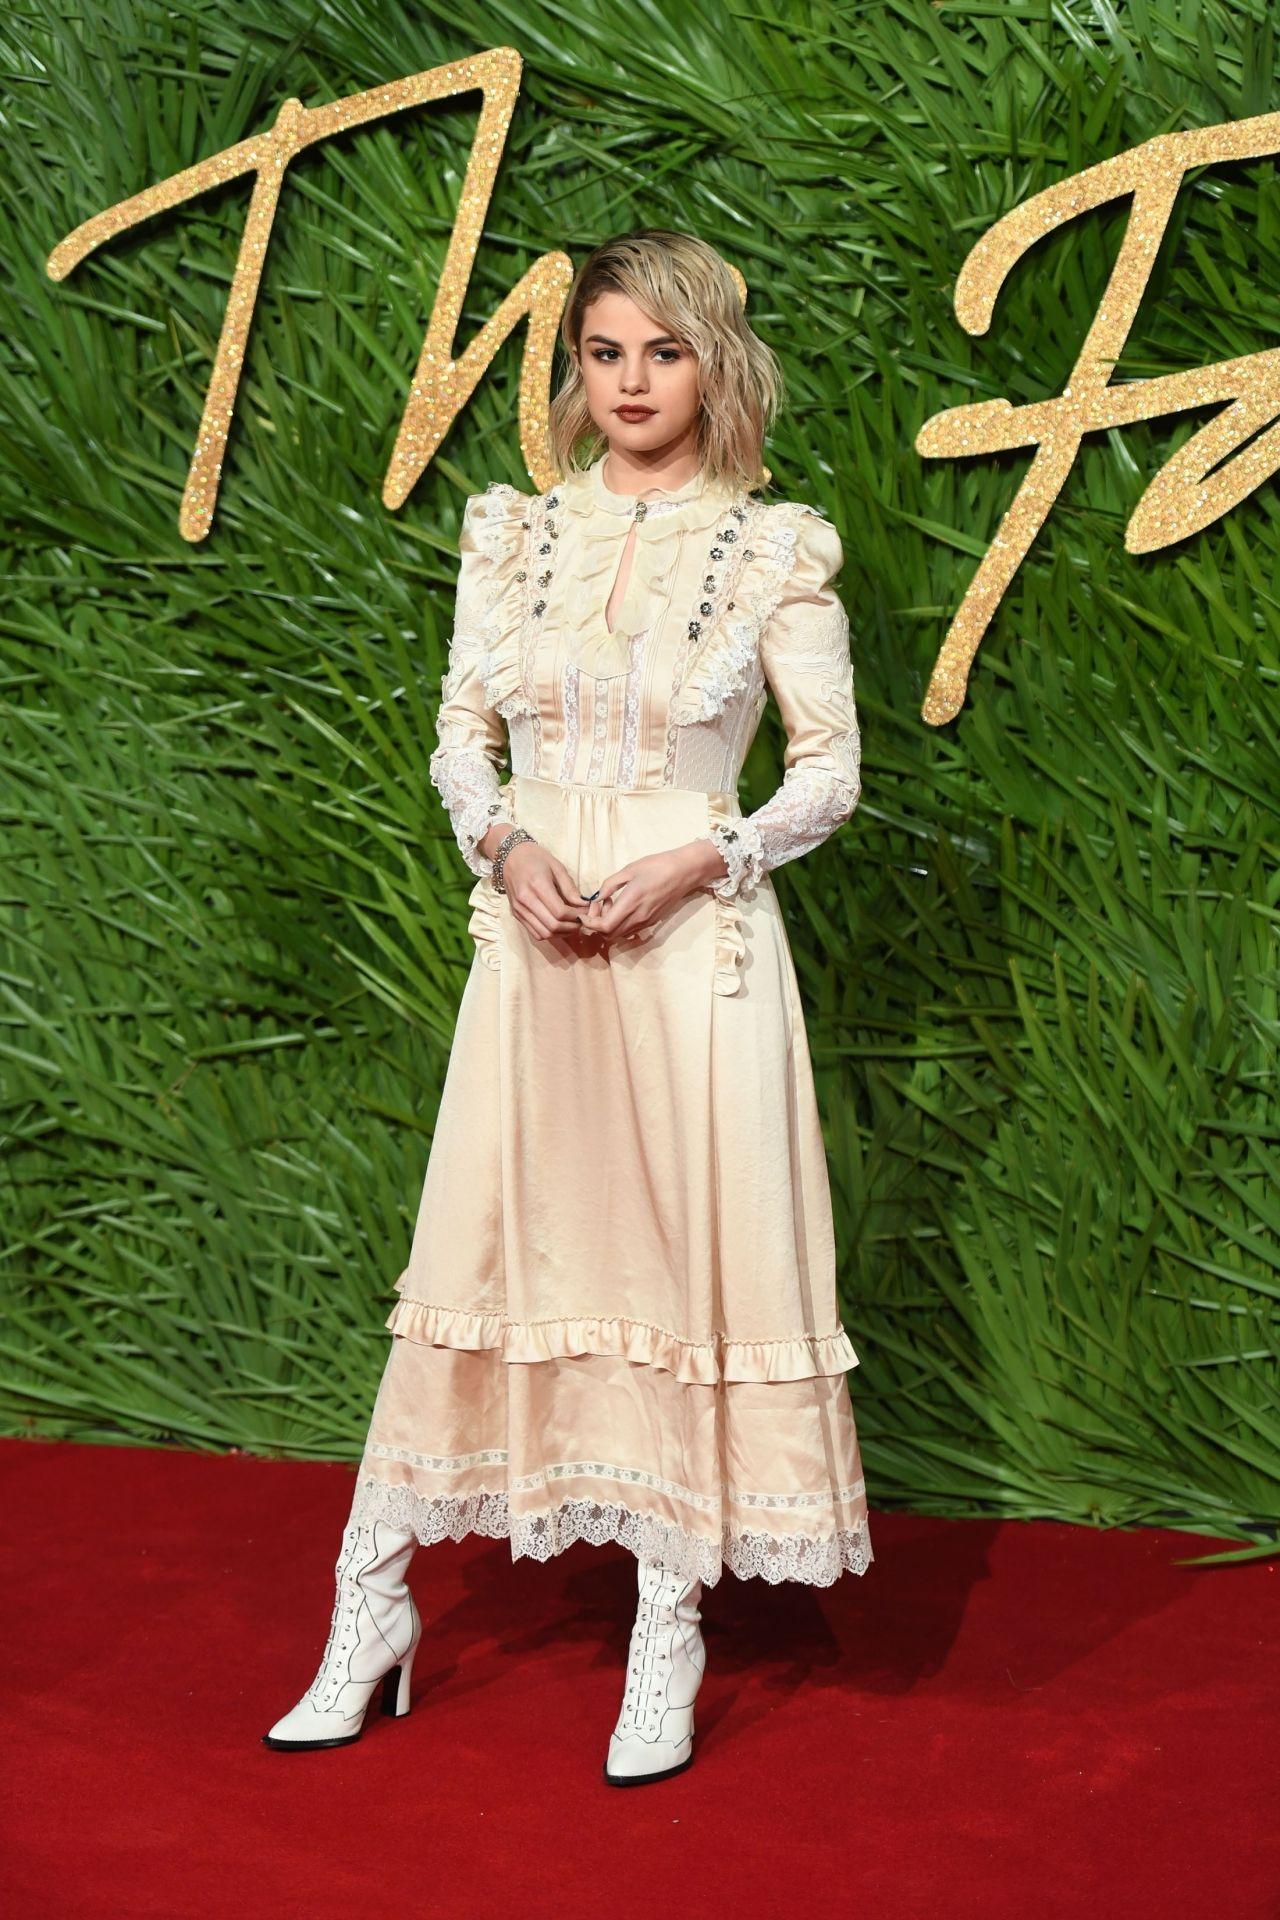 http://celebmafia.com/wp-content/uploads/2017/12/selena-gomez-fashion-awards-2017-in-london-0.jpg